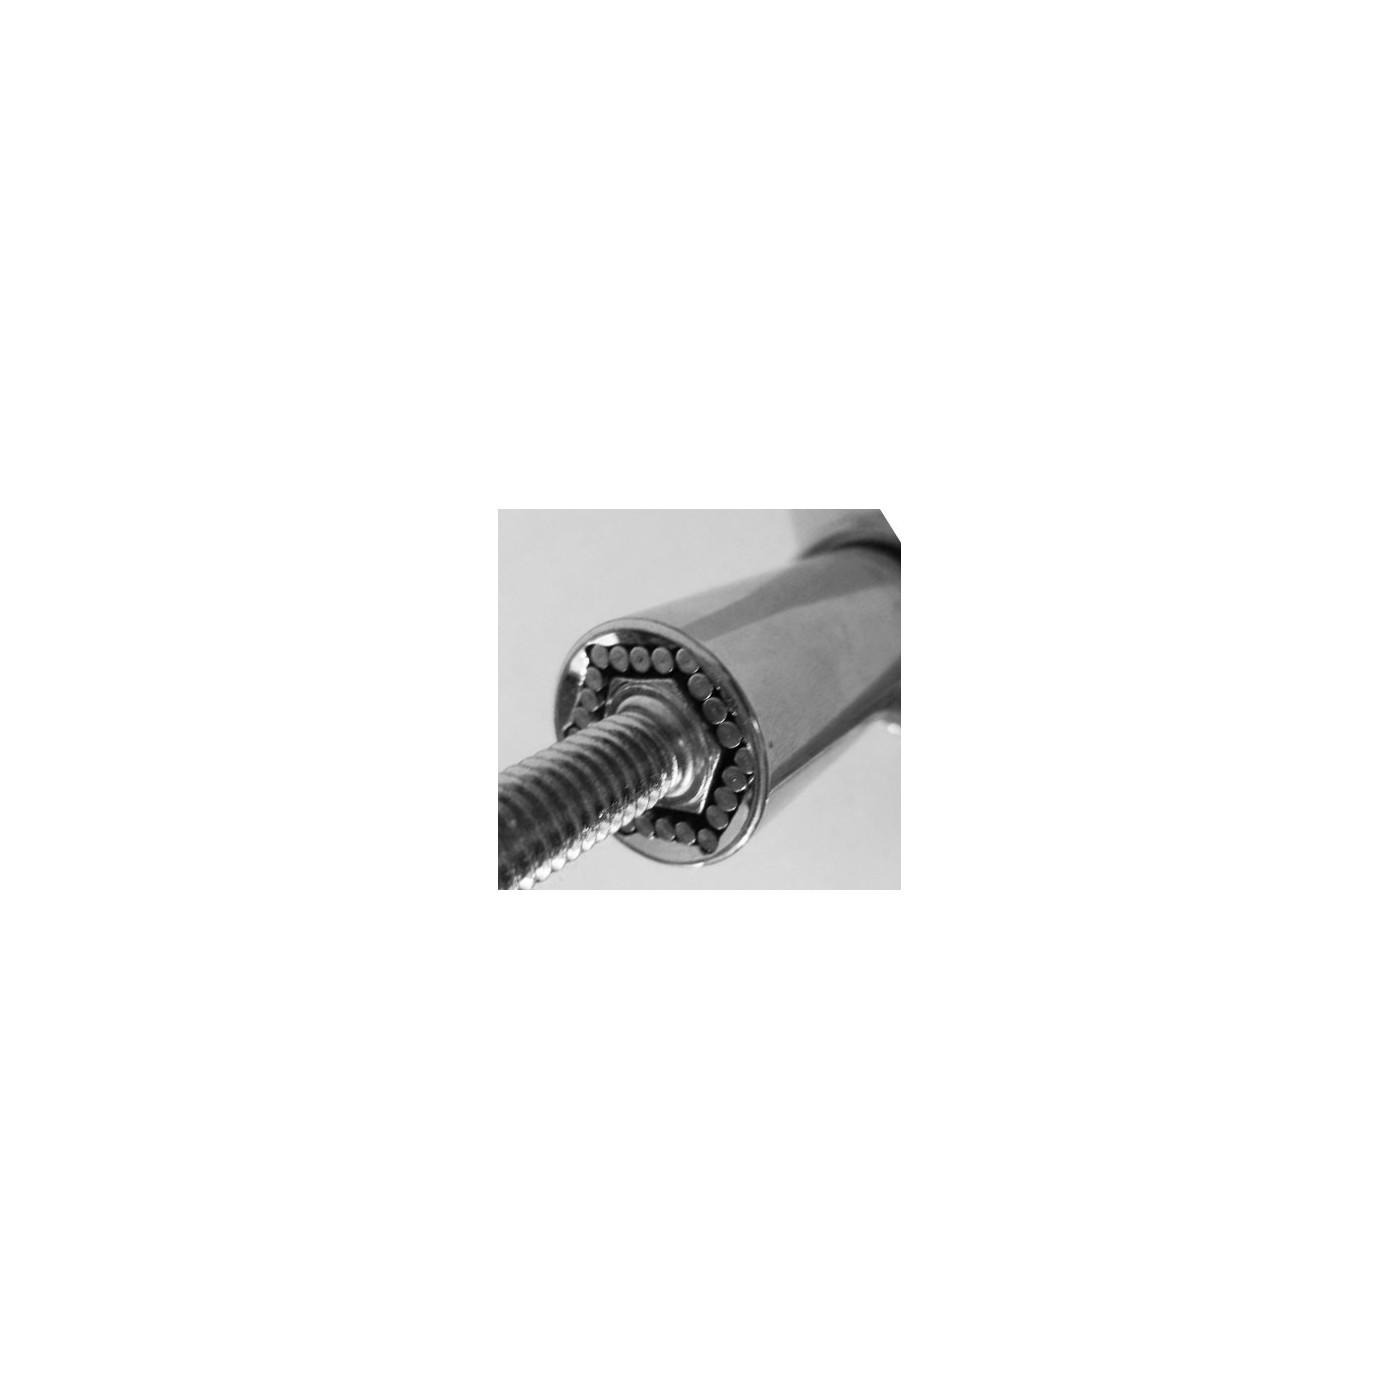 Gator grip MEDIUM, chave de soquete universal 9-27 mm  - 1